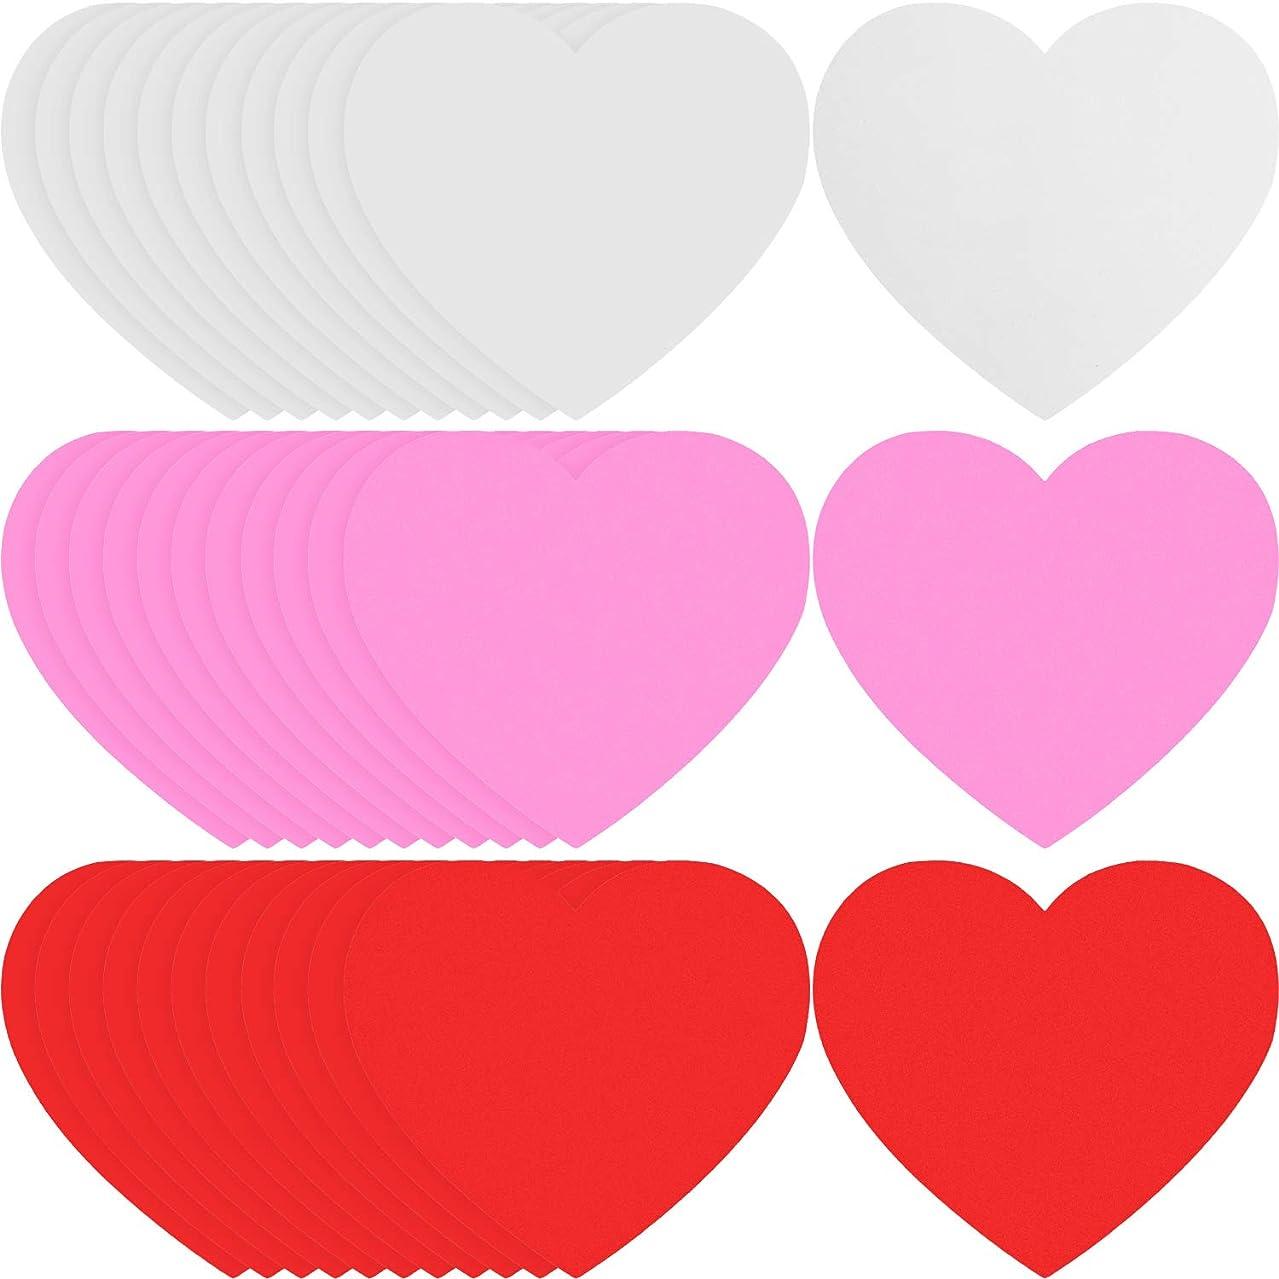 TecUnite 36 Pieces Valentine's Day Foam Heart Valentine Craft Heart Decor Heart Shape Foam, 5.5 by 4.3 inch, 3 Colors